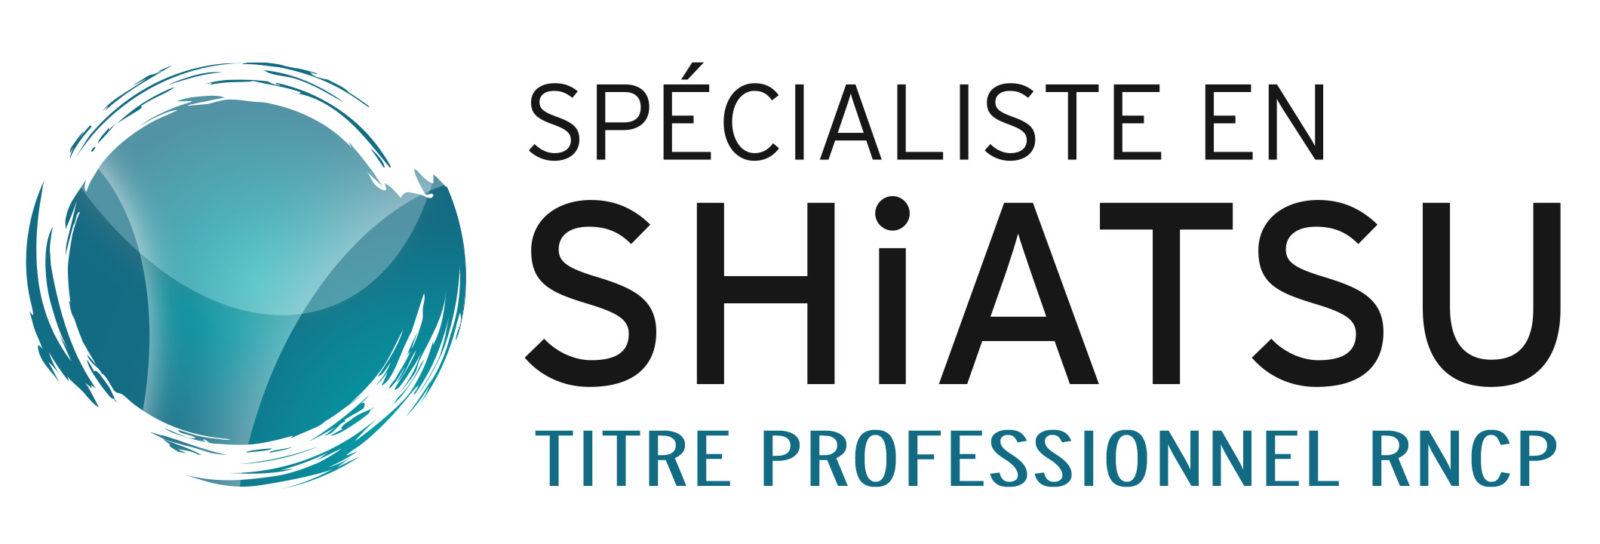 Shiatsu Melun 77 Seine-et-marne Shiatsu Particuliers Entreprise Denis Nivet